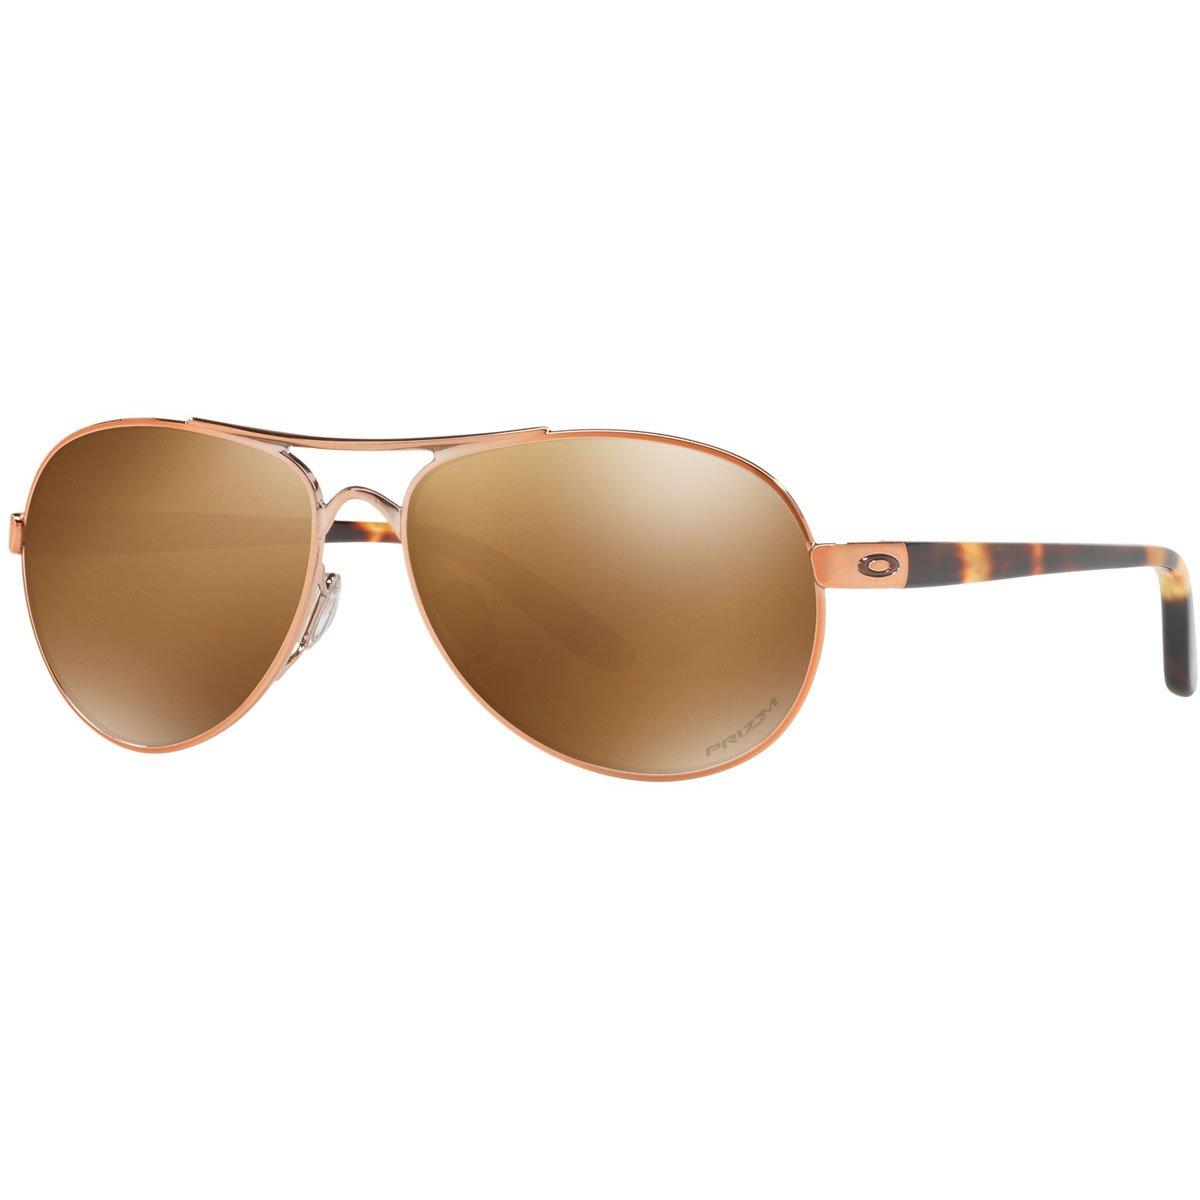 Oakley Women's Metal Woman Polarized Aviator Sunglasses, Rose Gold, 56 mm